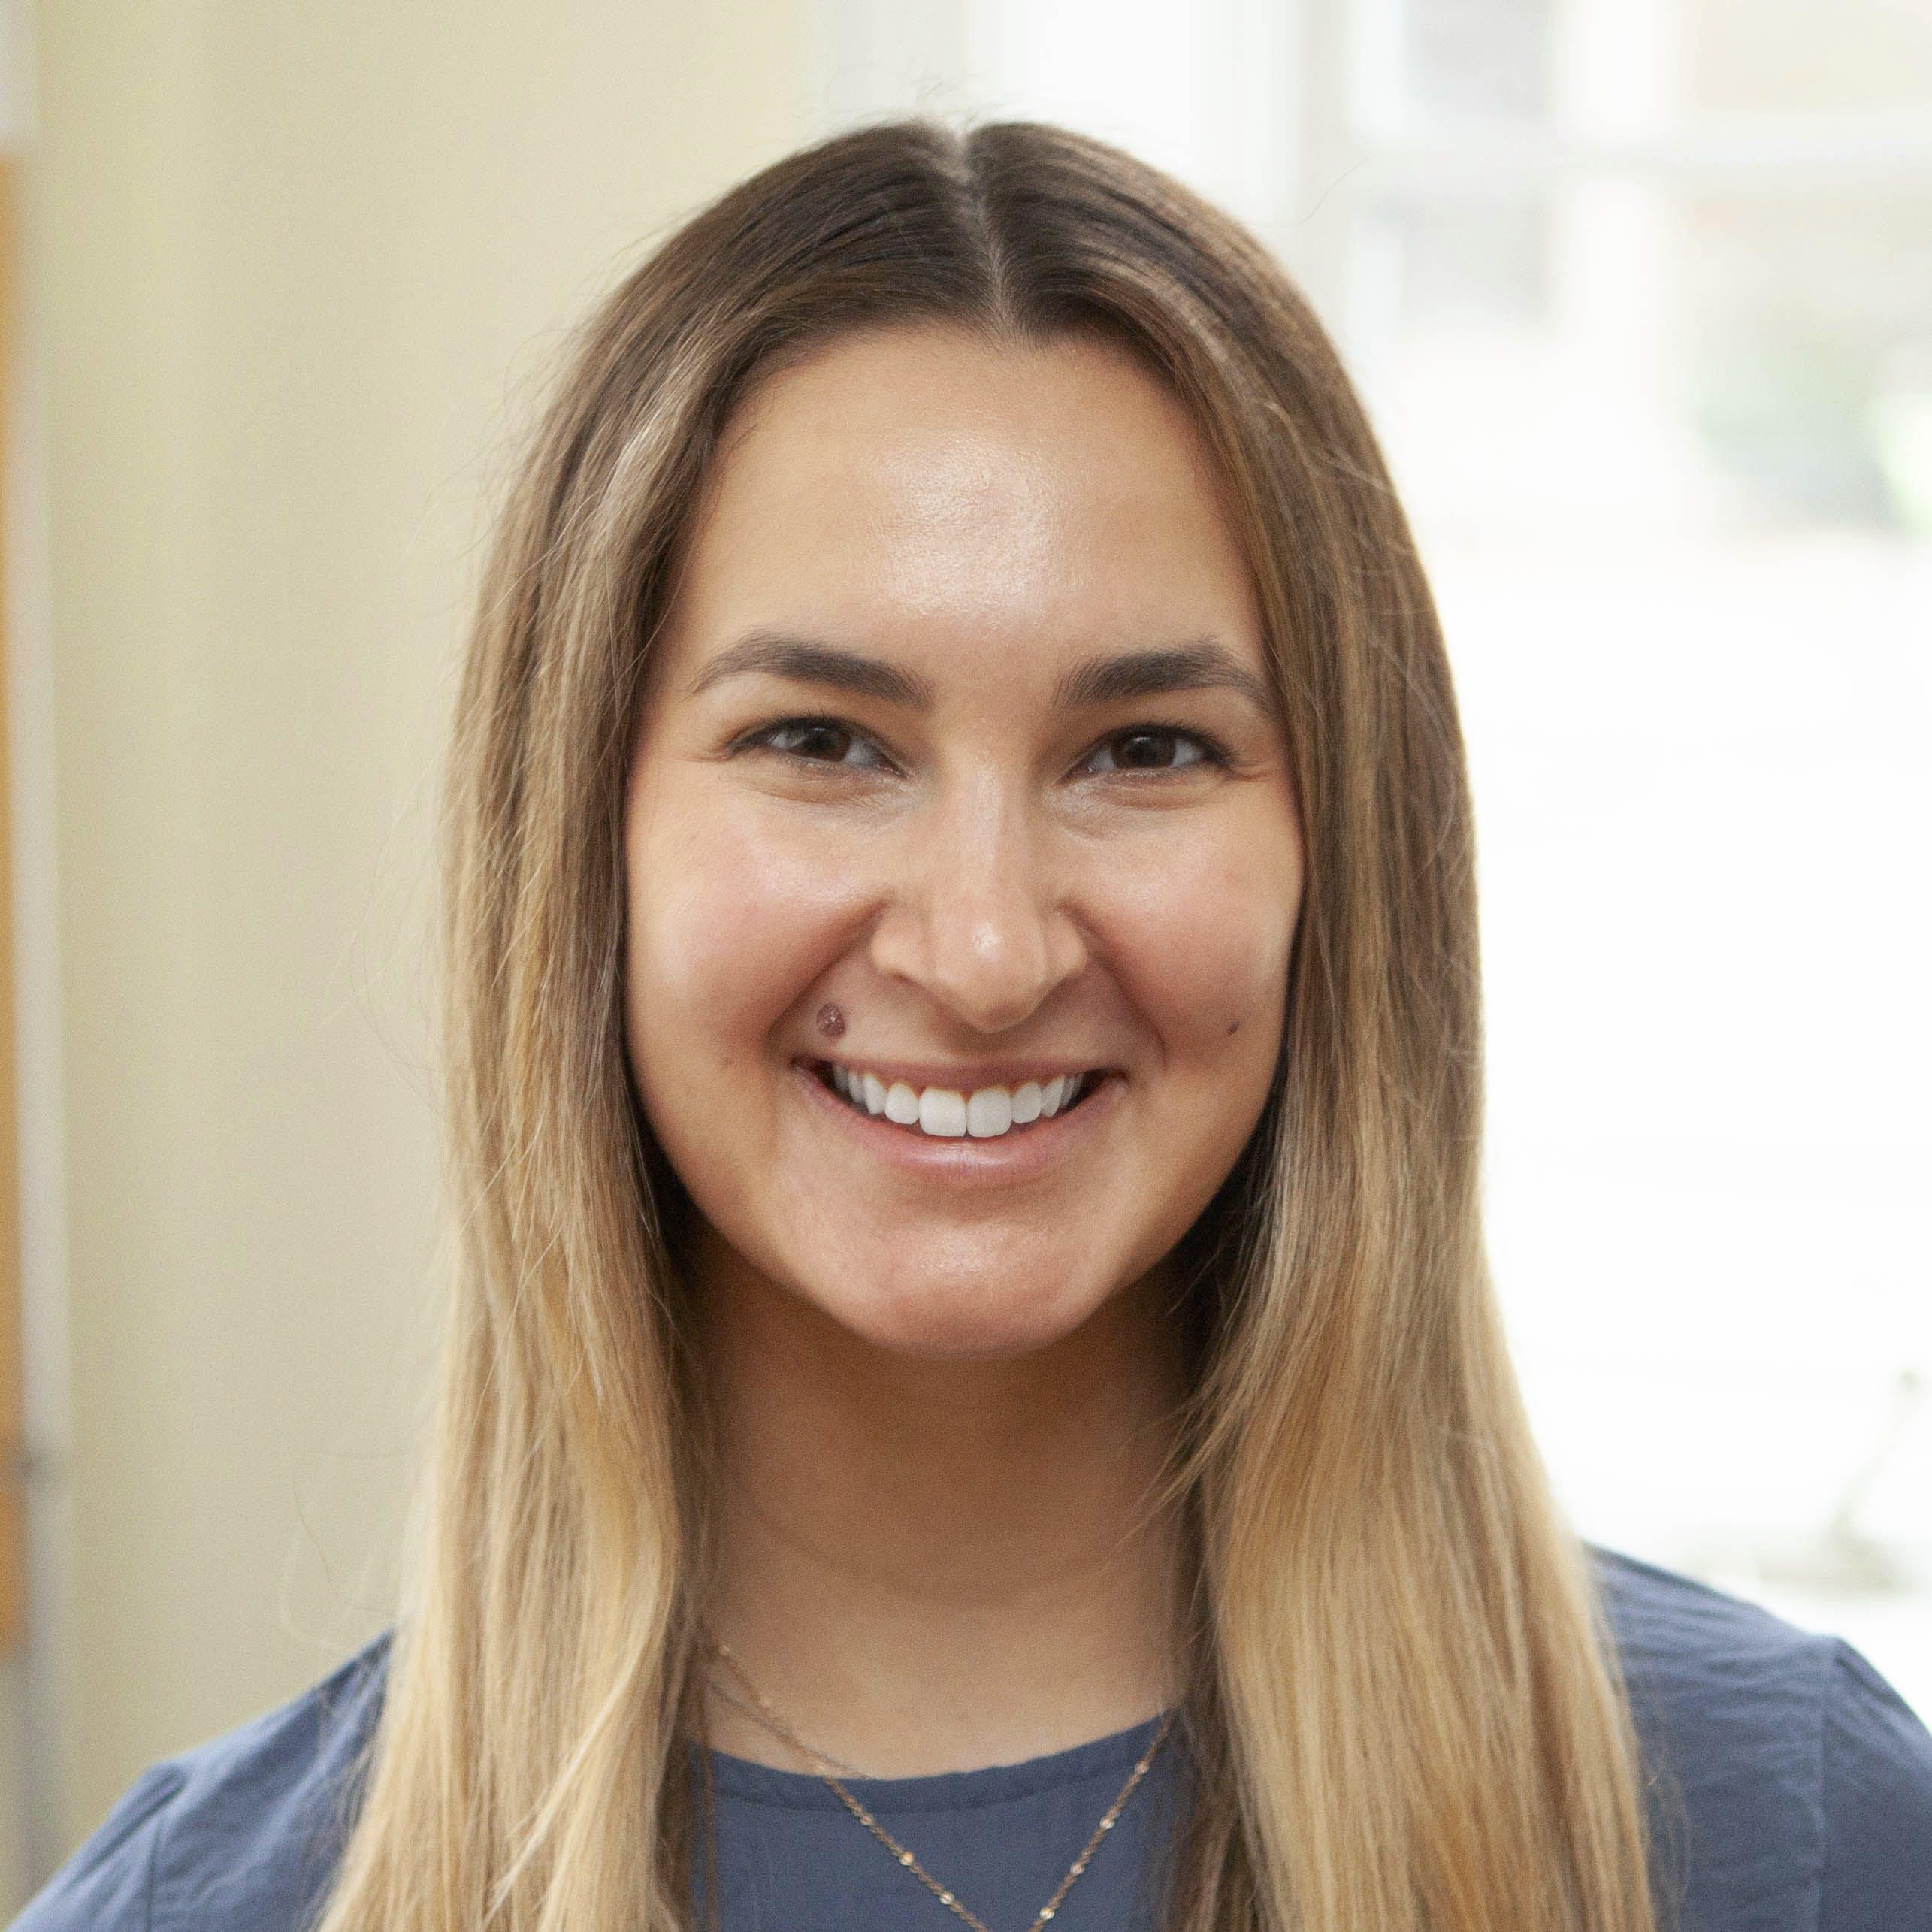 Katy DiLorenzo, PT, DPT